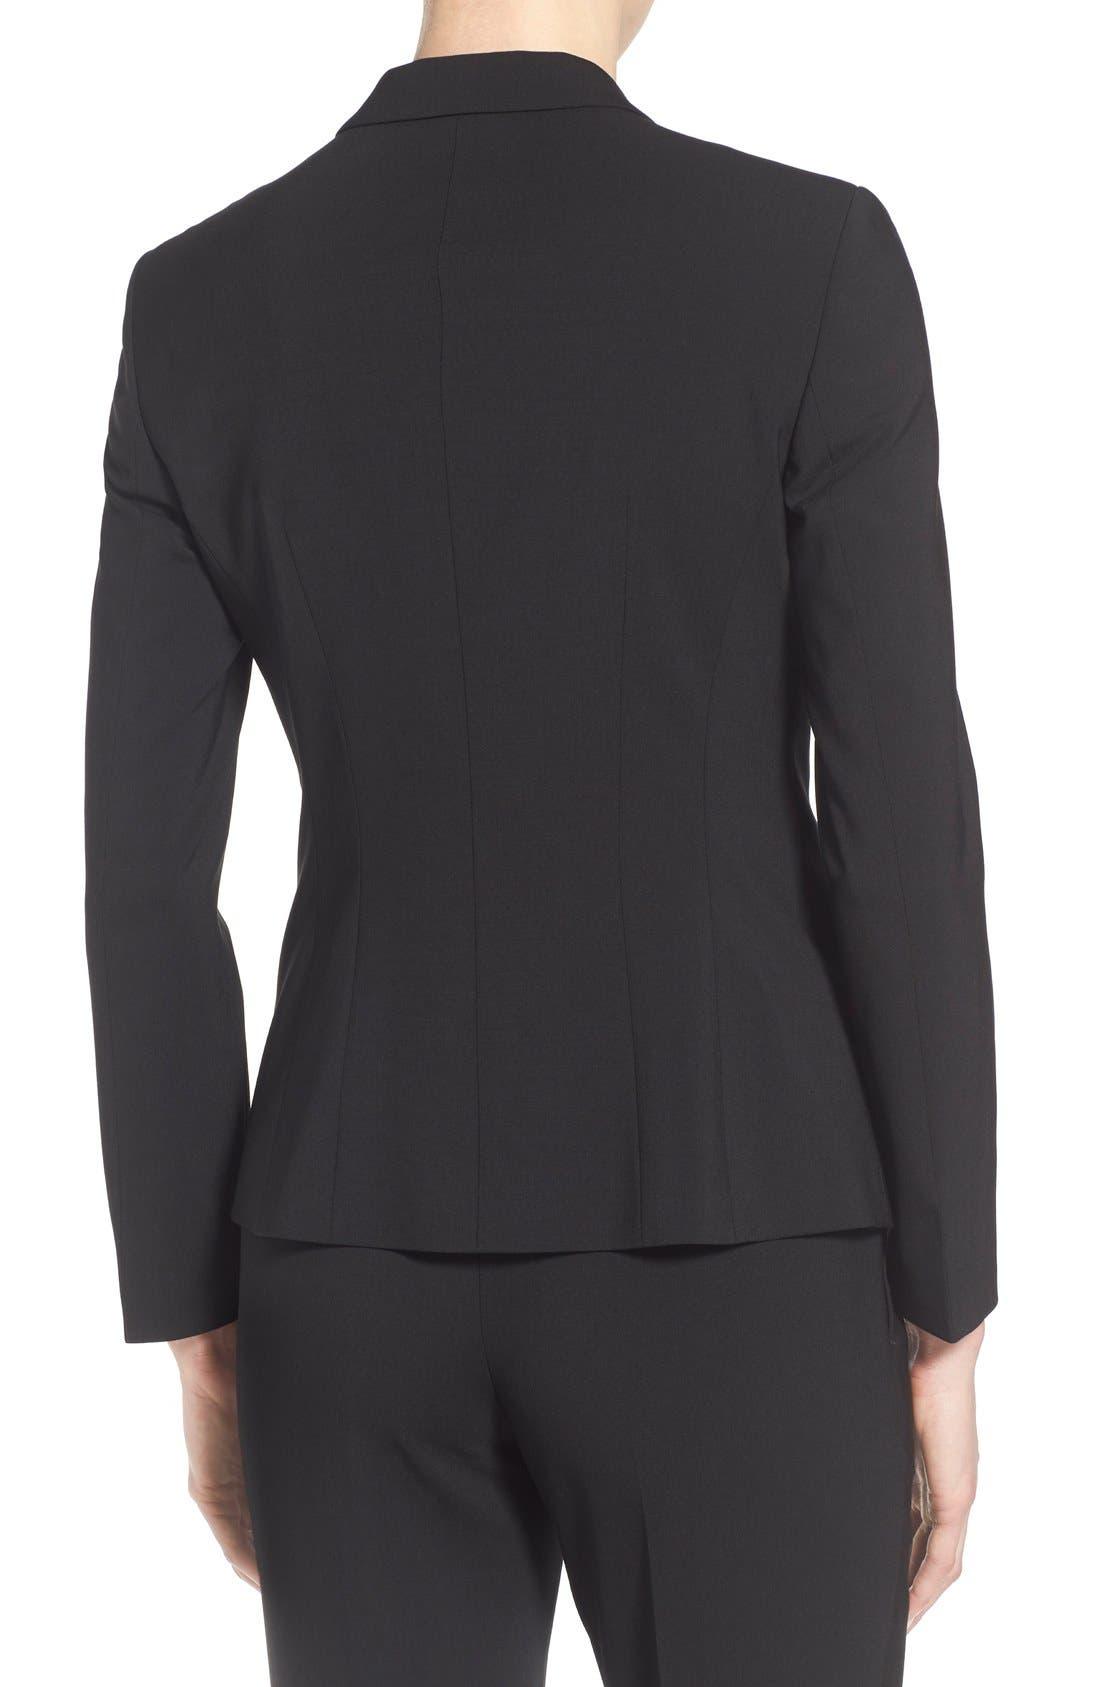 Julea Tropical Stretch Wool Jacket,                             Alternate thumbnail 7, color,                             BLACK